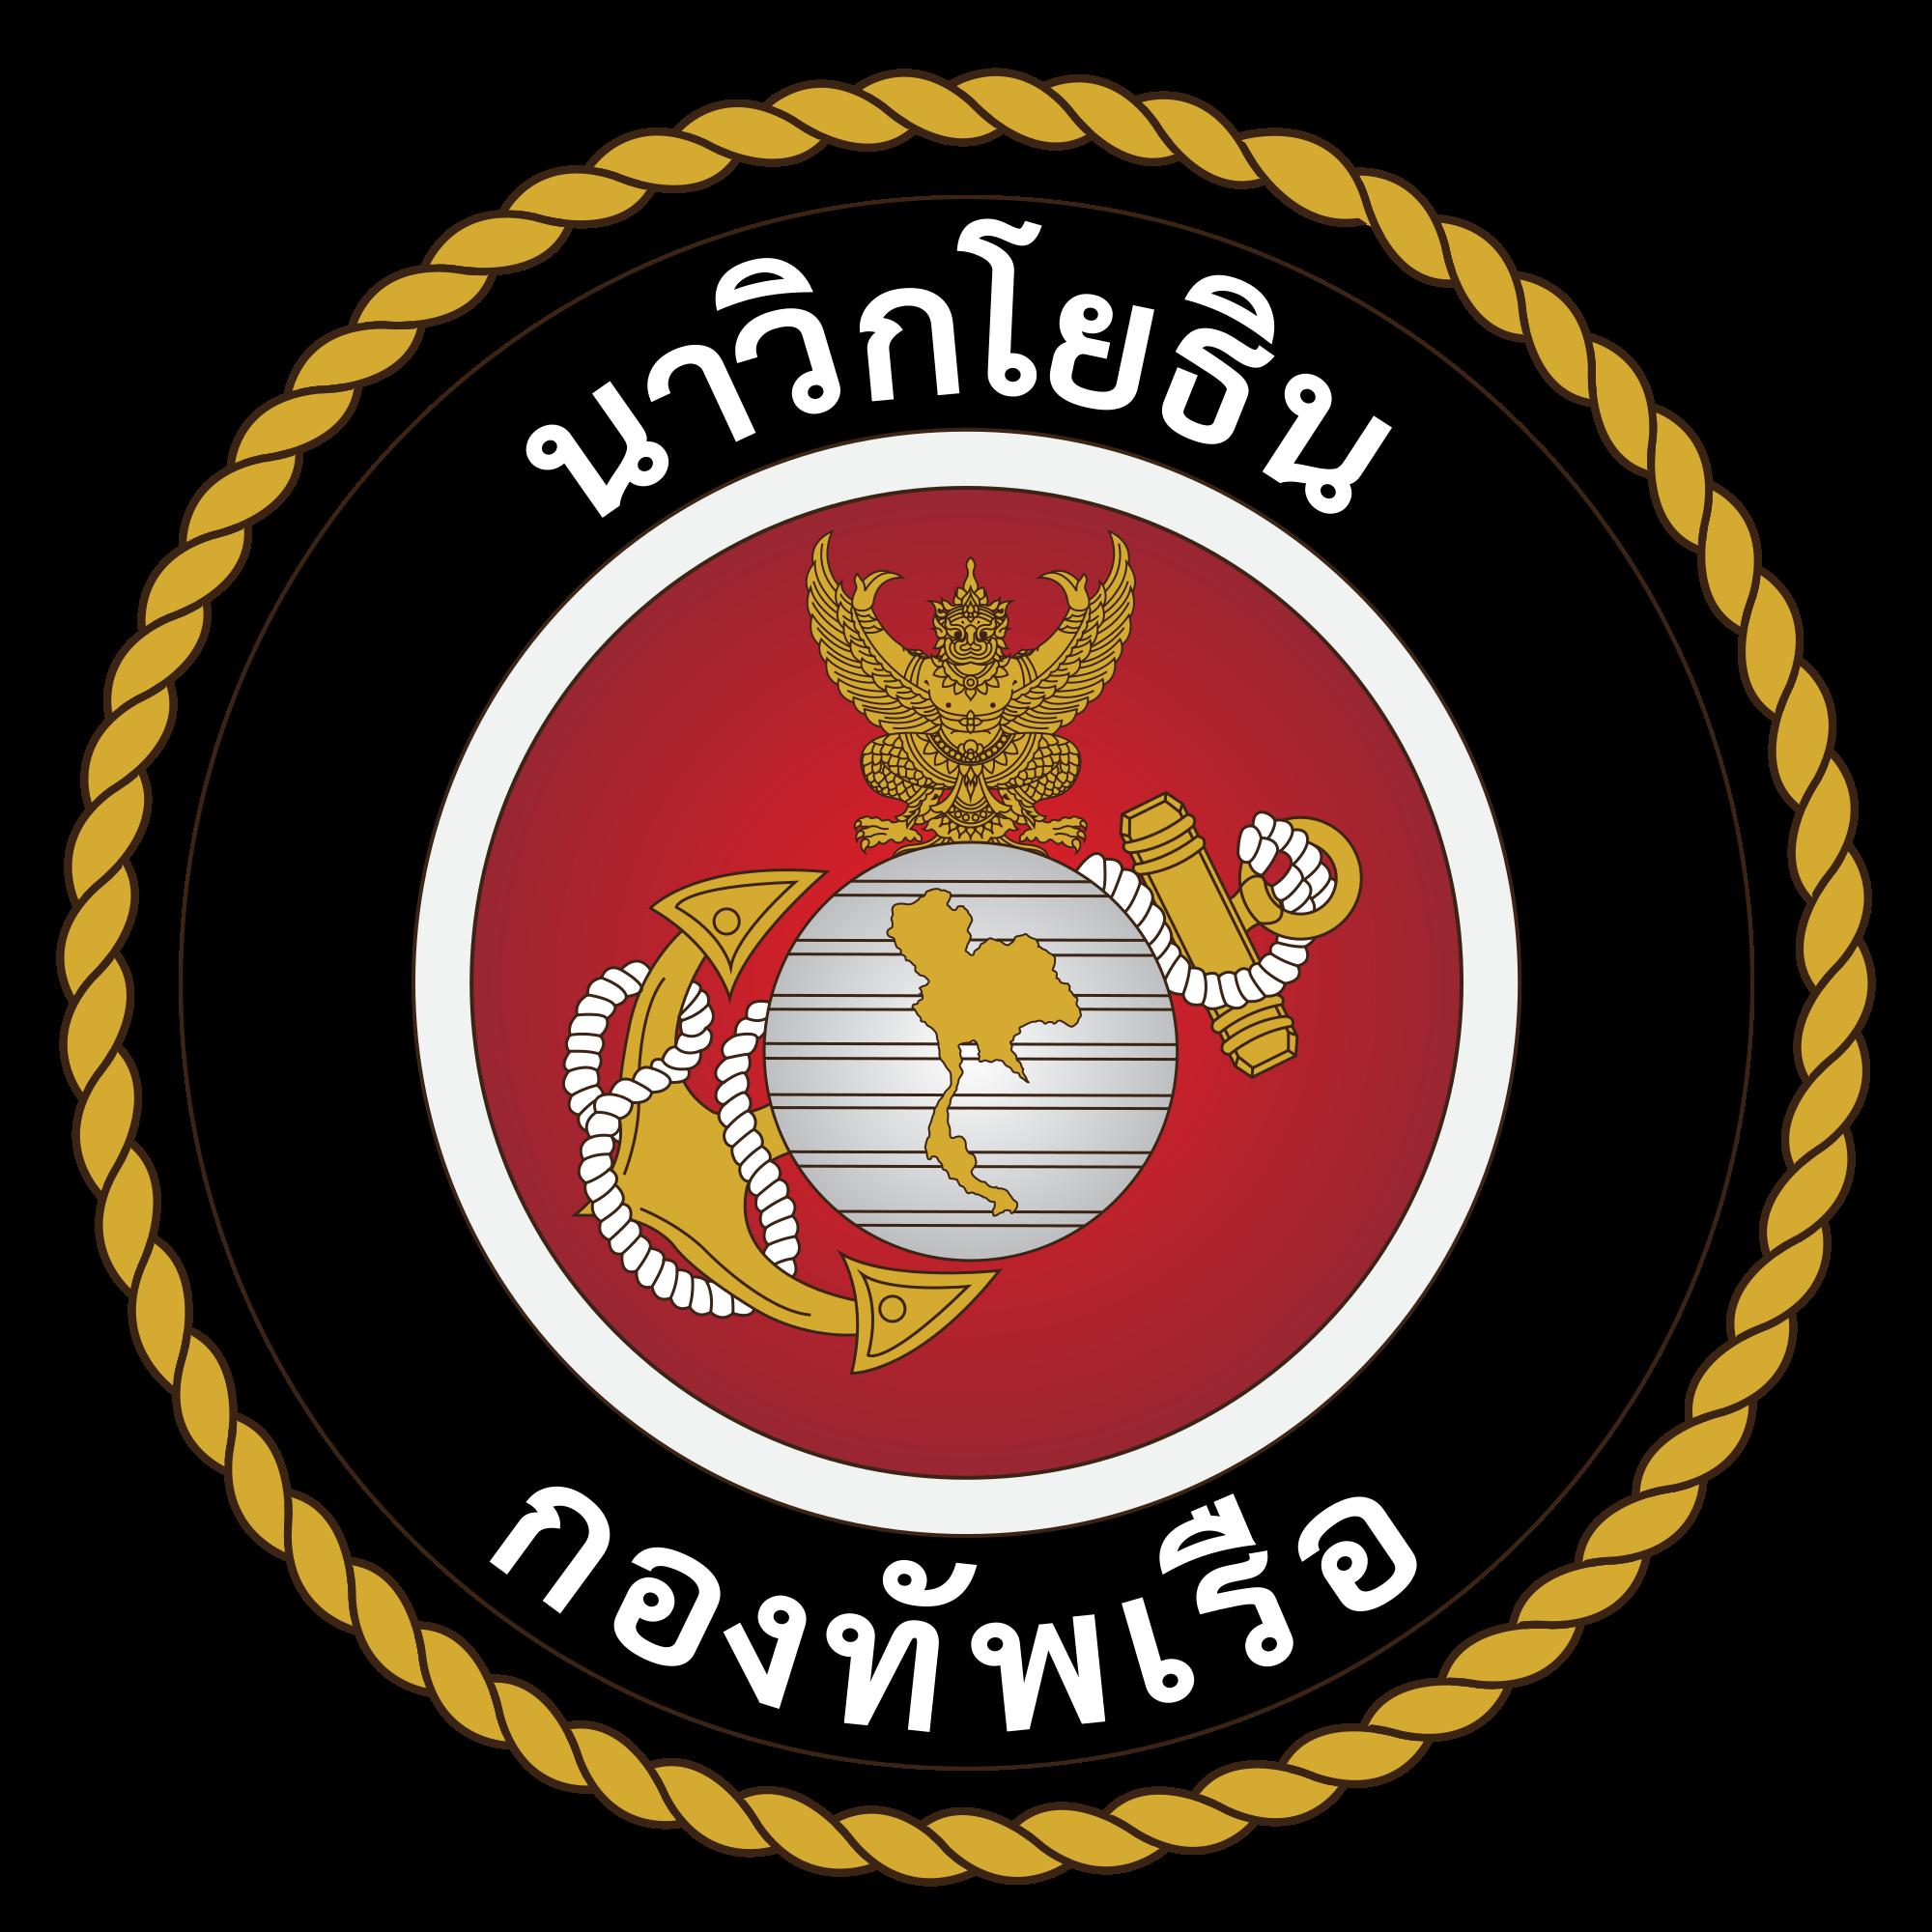 2000x2000 Fileinsignia Of Royal Thai Marine Corps.svg